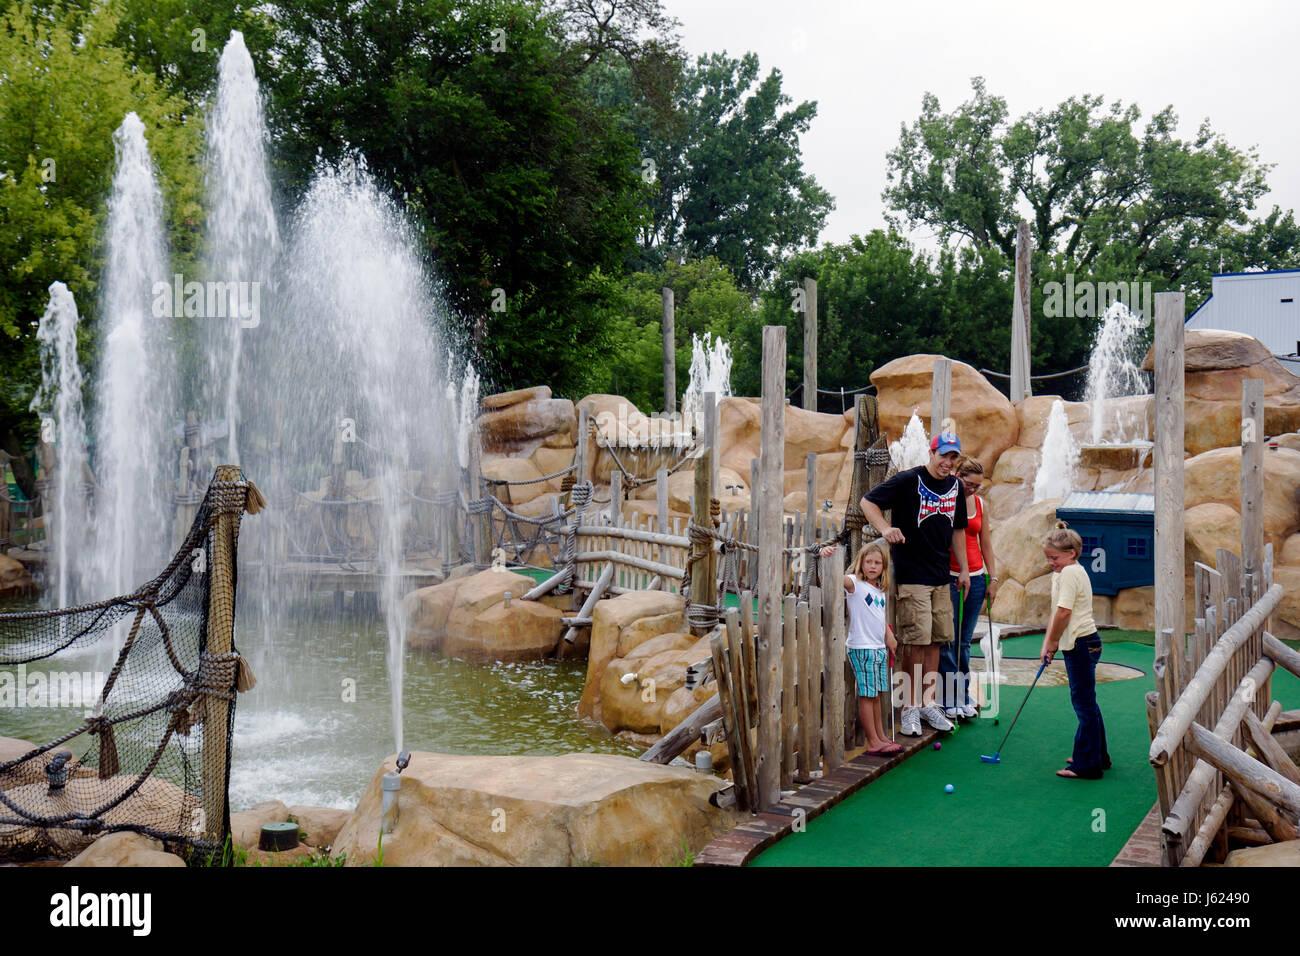 Indiana Valparaiso Zao Island Entertainment Center miniature golf fountains family entertainment man woman boy girl Stock Photo